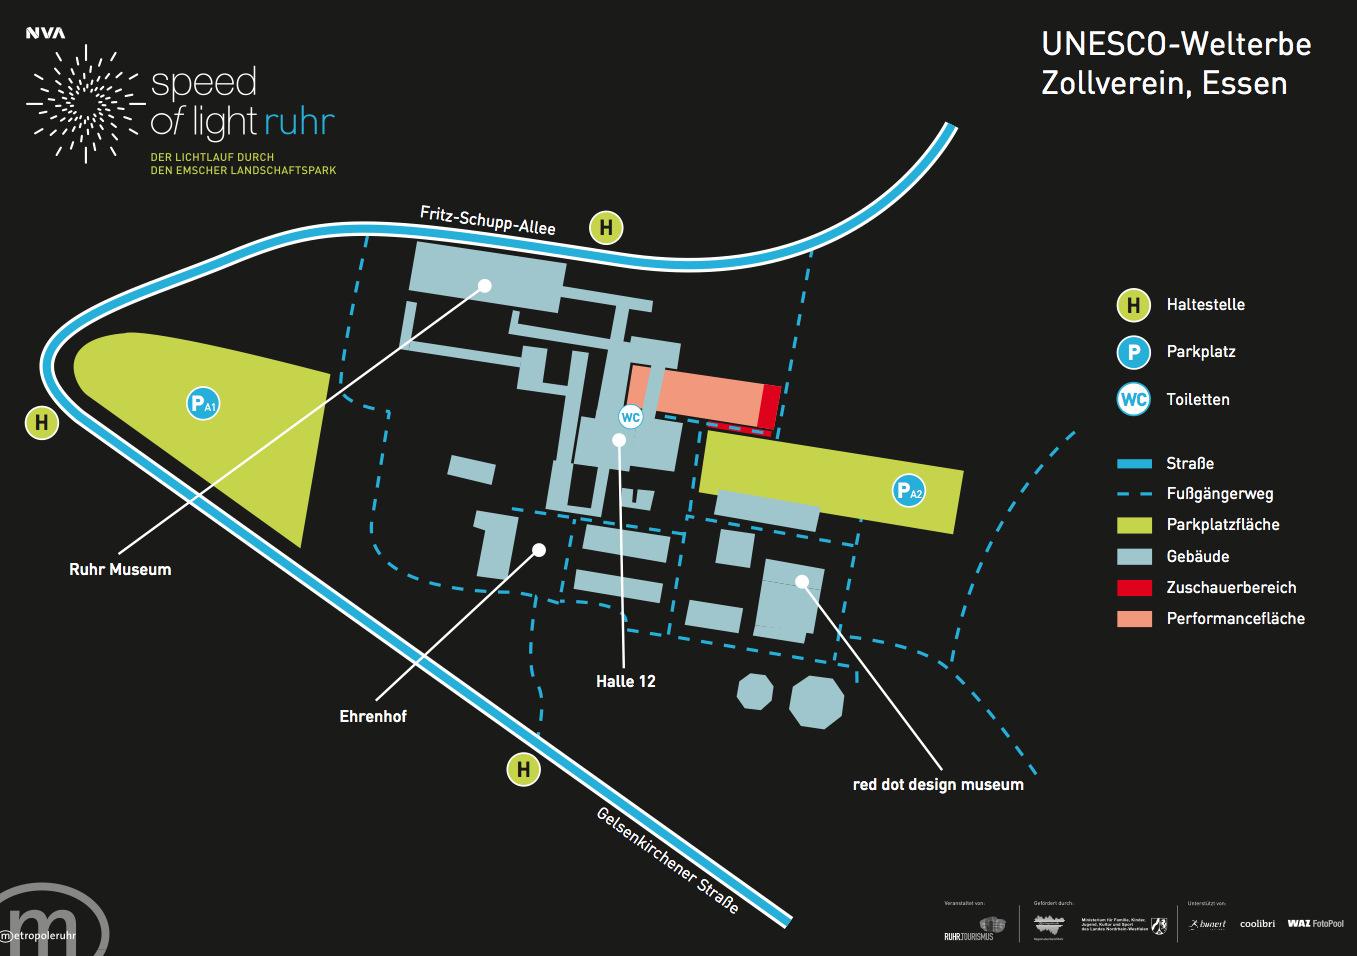 UNESCO Welterbe Zollverein Essen Zeche Zollverein Weltkulturerbe Speed of Light SOL NVA nvasol